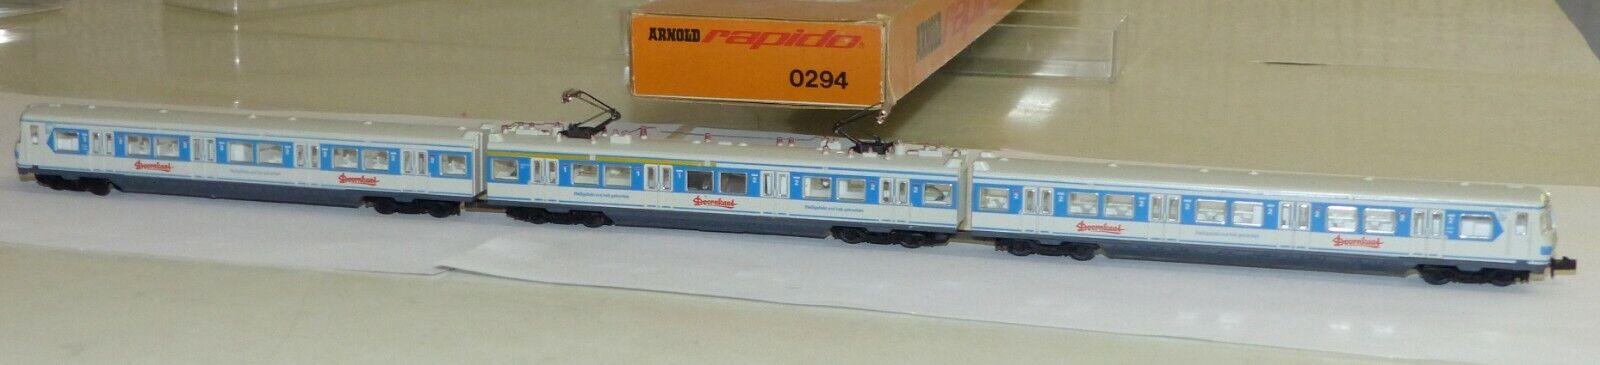 Arnold 0294 S-Bahn triebzug et 420 doornkaat 3 pzas. pista n 1 160 OVP muy bien